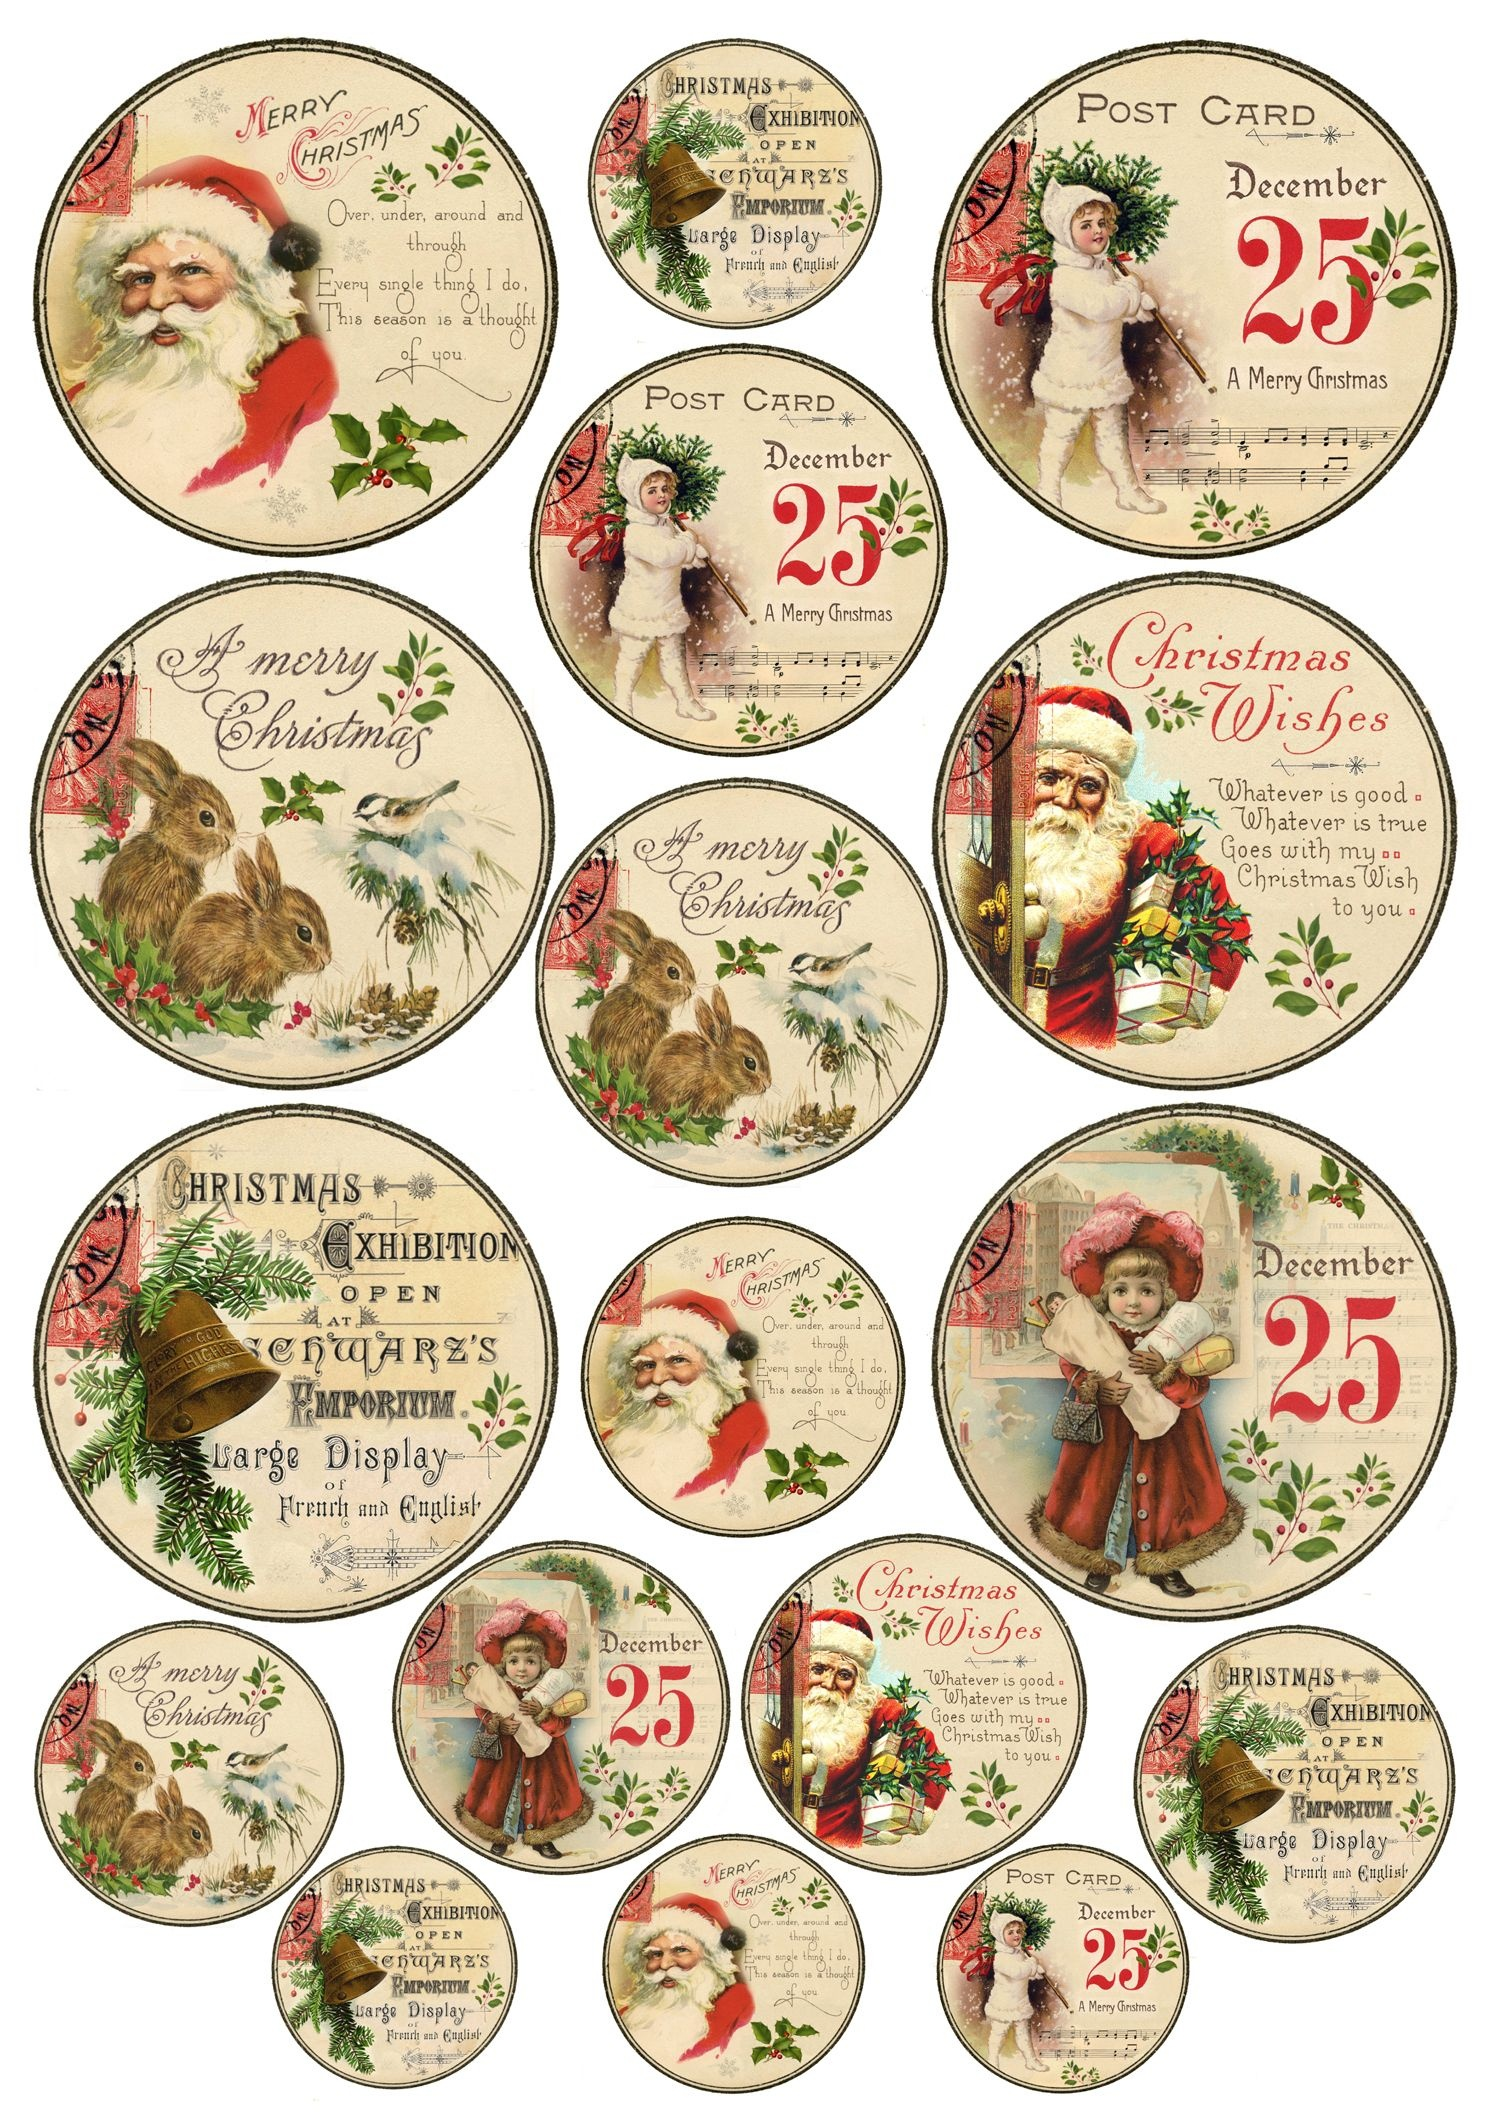 Diy Vintage Gold Christmas Gift Tags - Free Printable | Kerstmis - Diy Christmas Gift Tags Free Printable